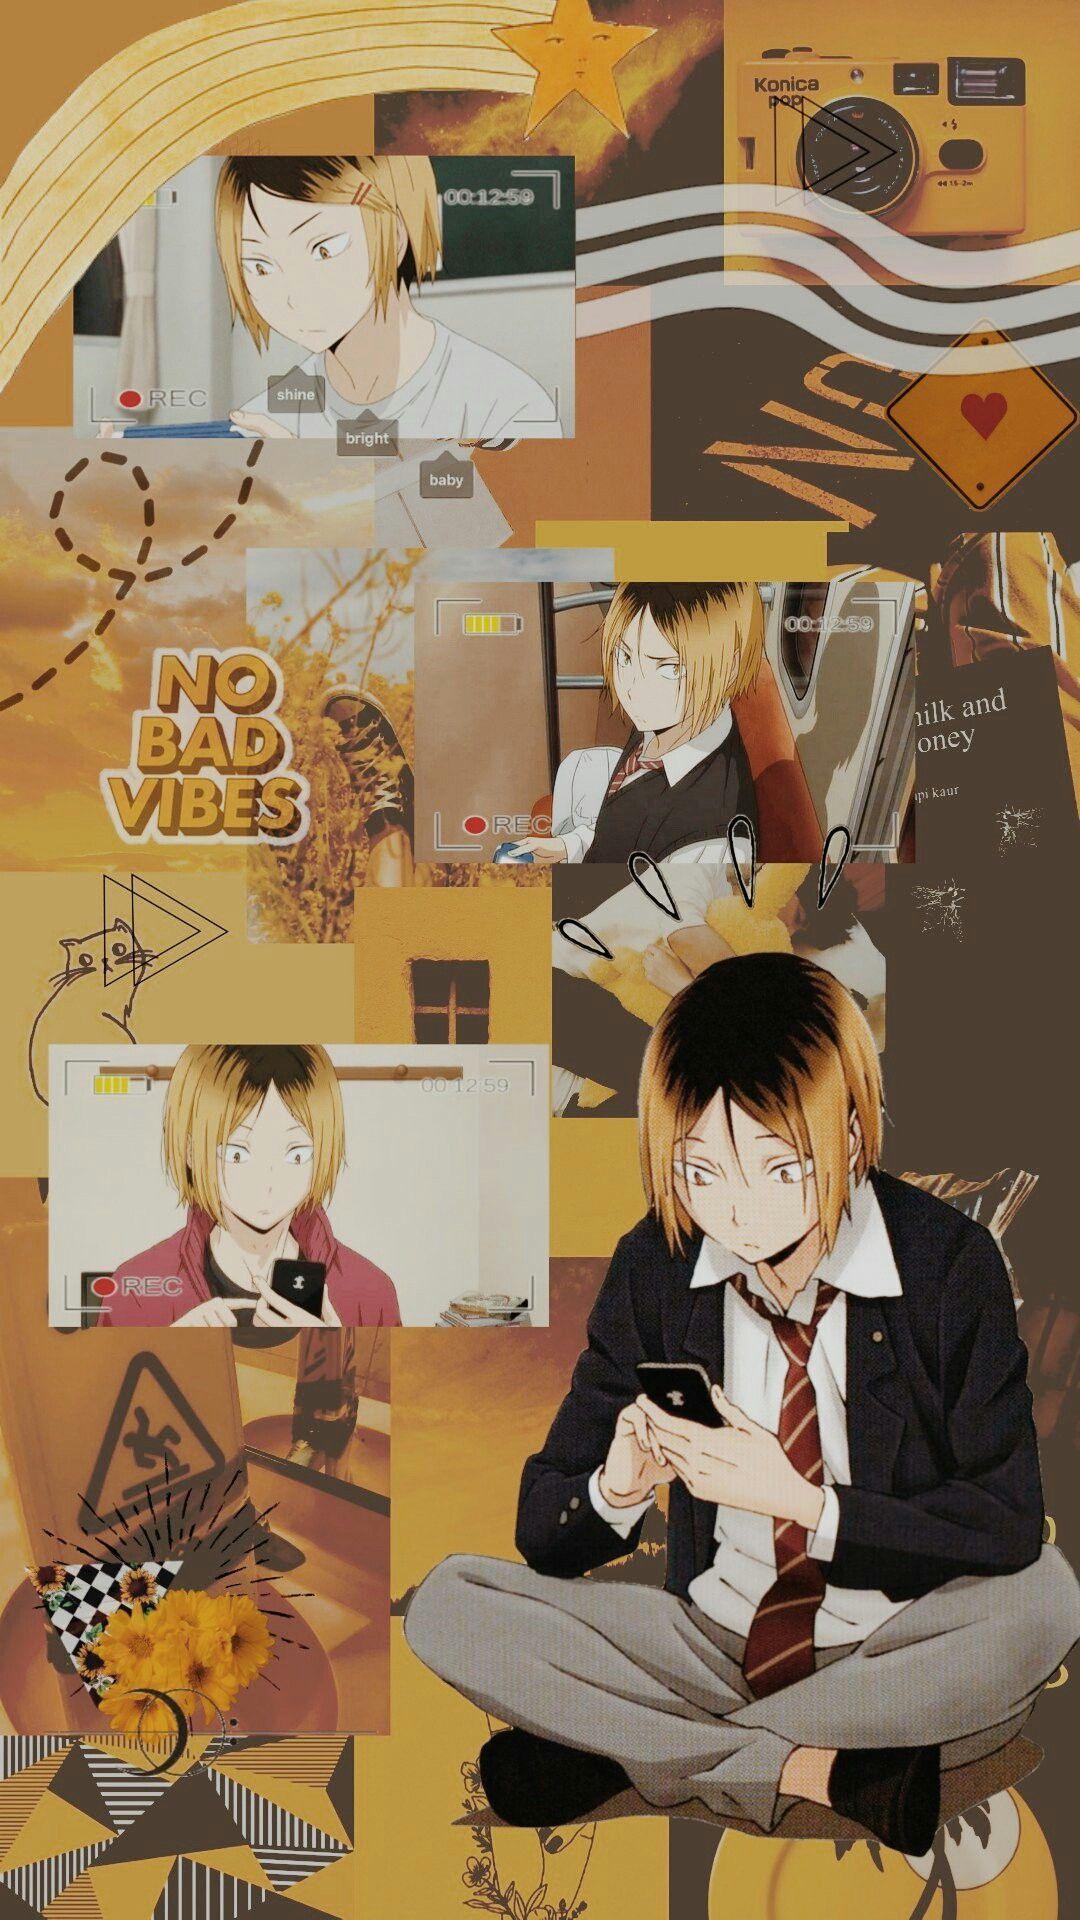 aesthetic anime wallpaper | Haikyuu anime, Anime wallpaper ...